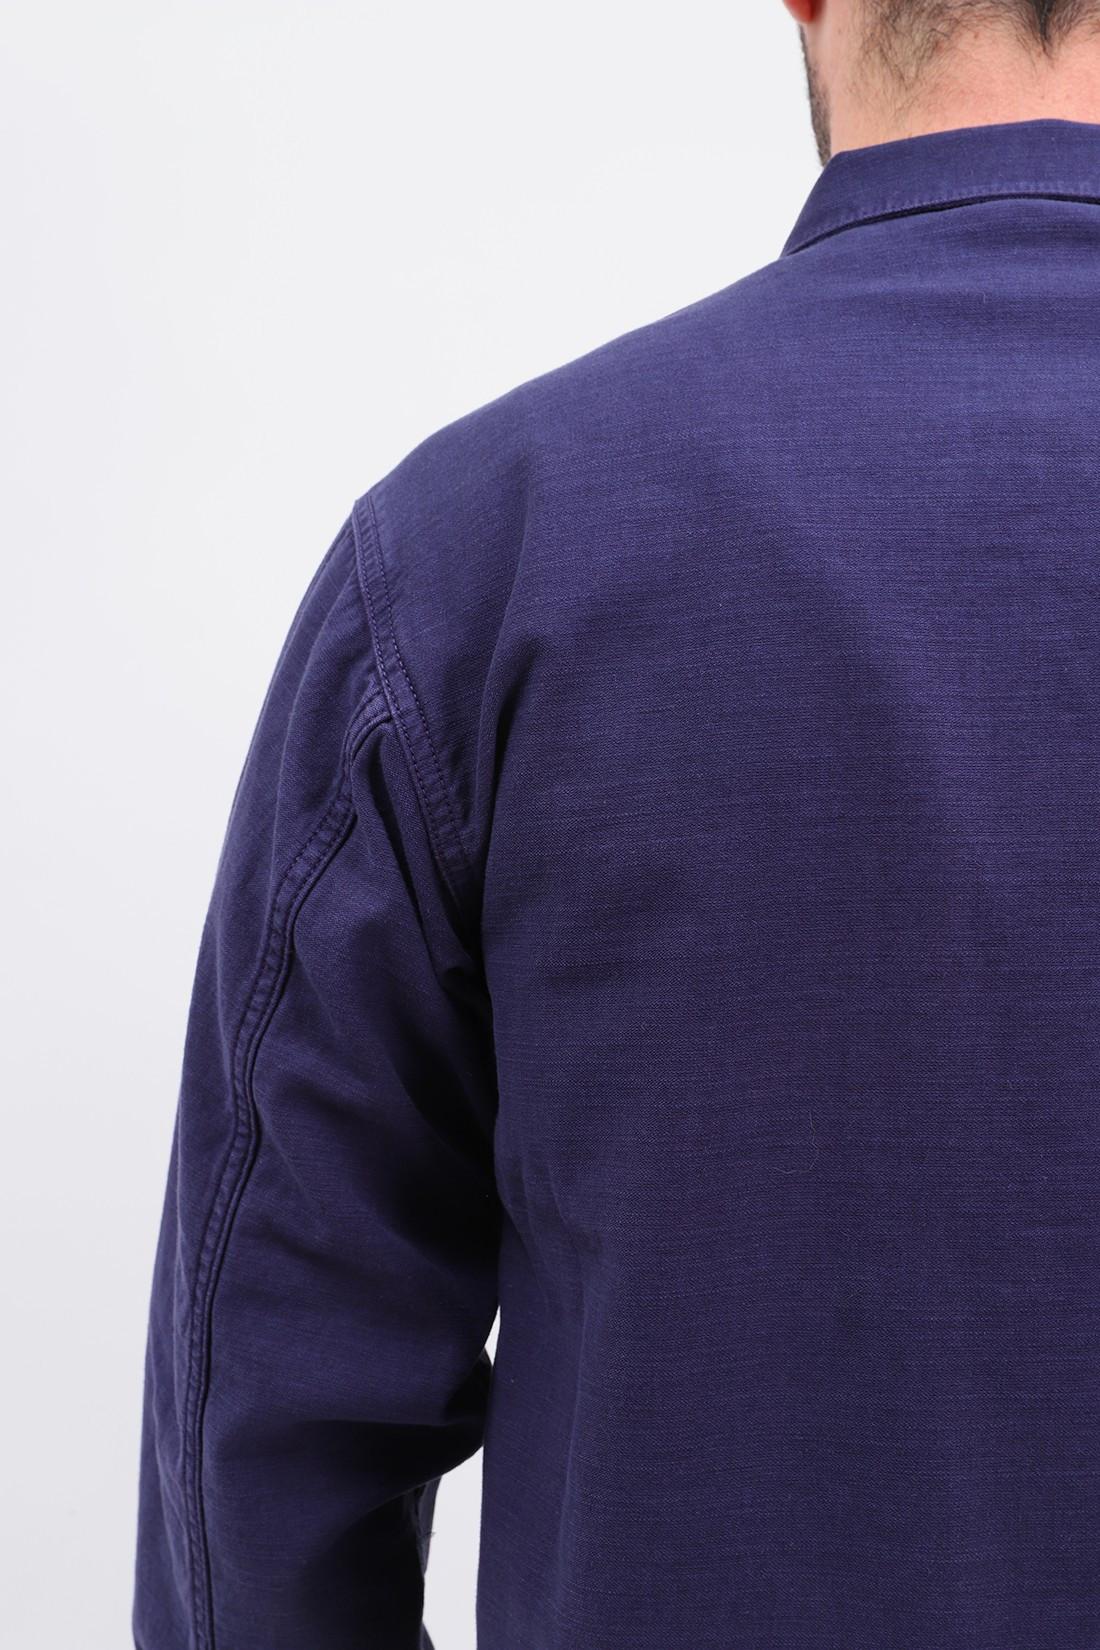 STAN RAY / Cpo shirt Navy sateen